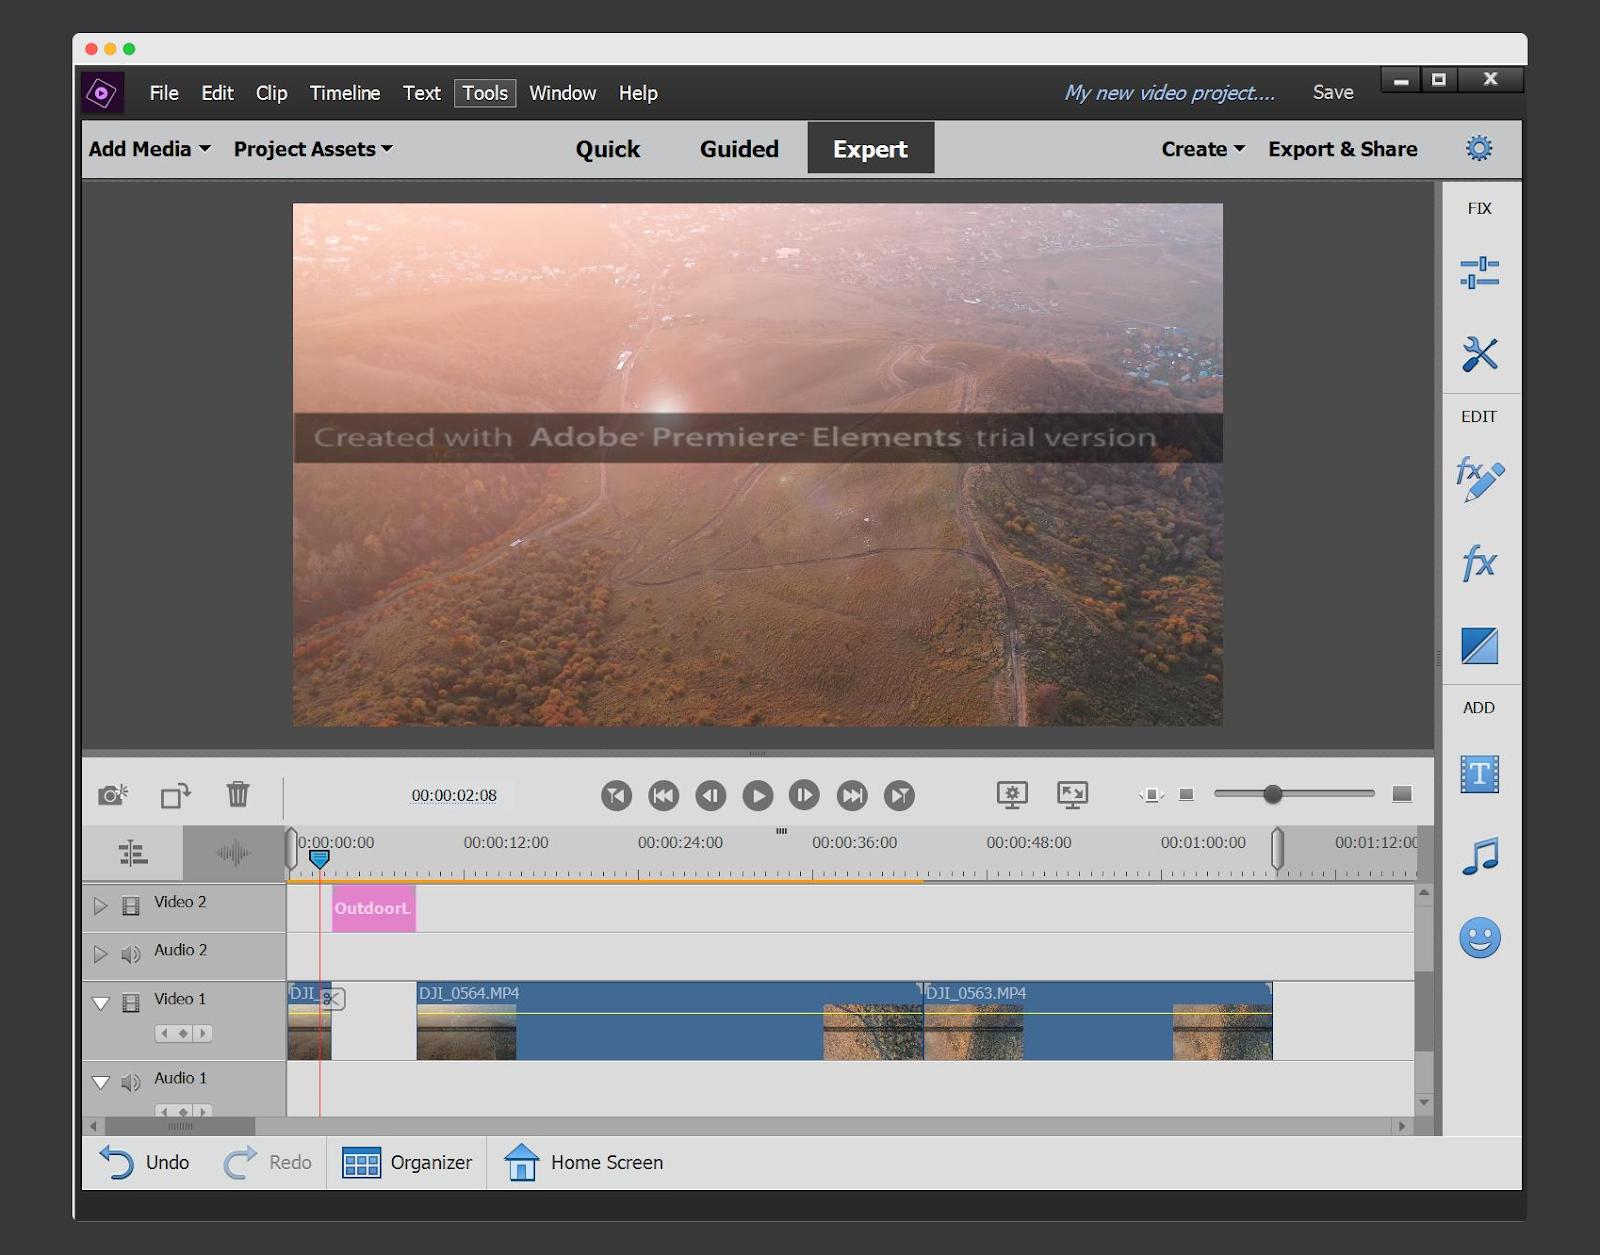 Screenshot of Adobe Premiere Elements